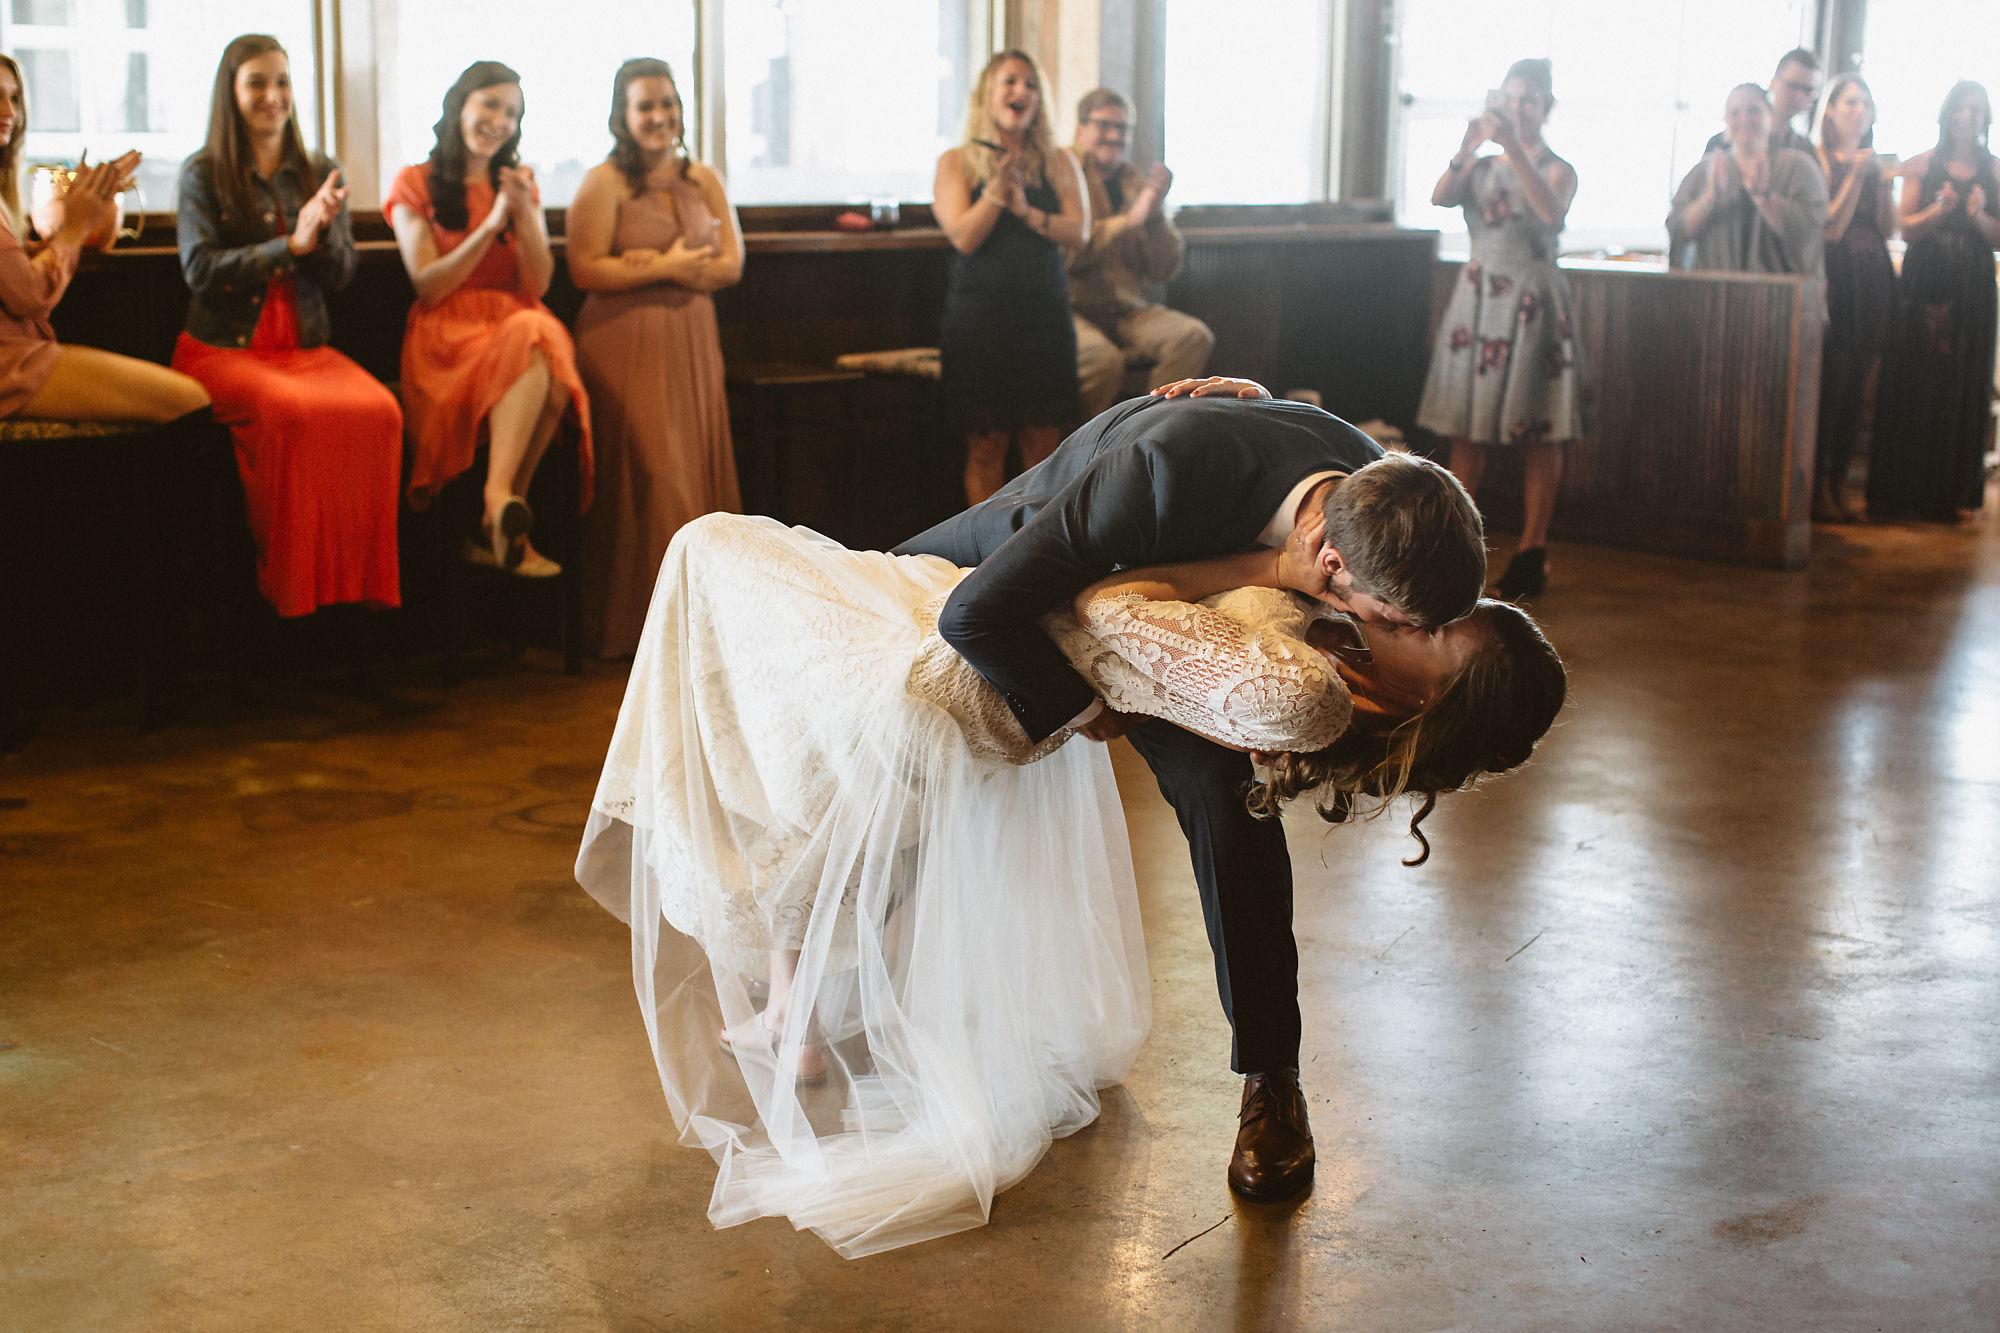 jessica_austin_oasis_brewery_wedding_photos153757.jpg